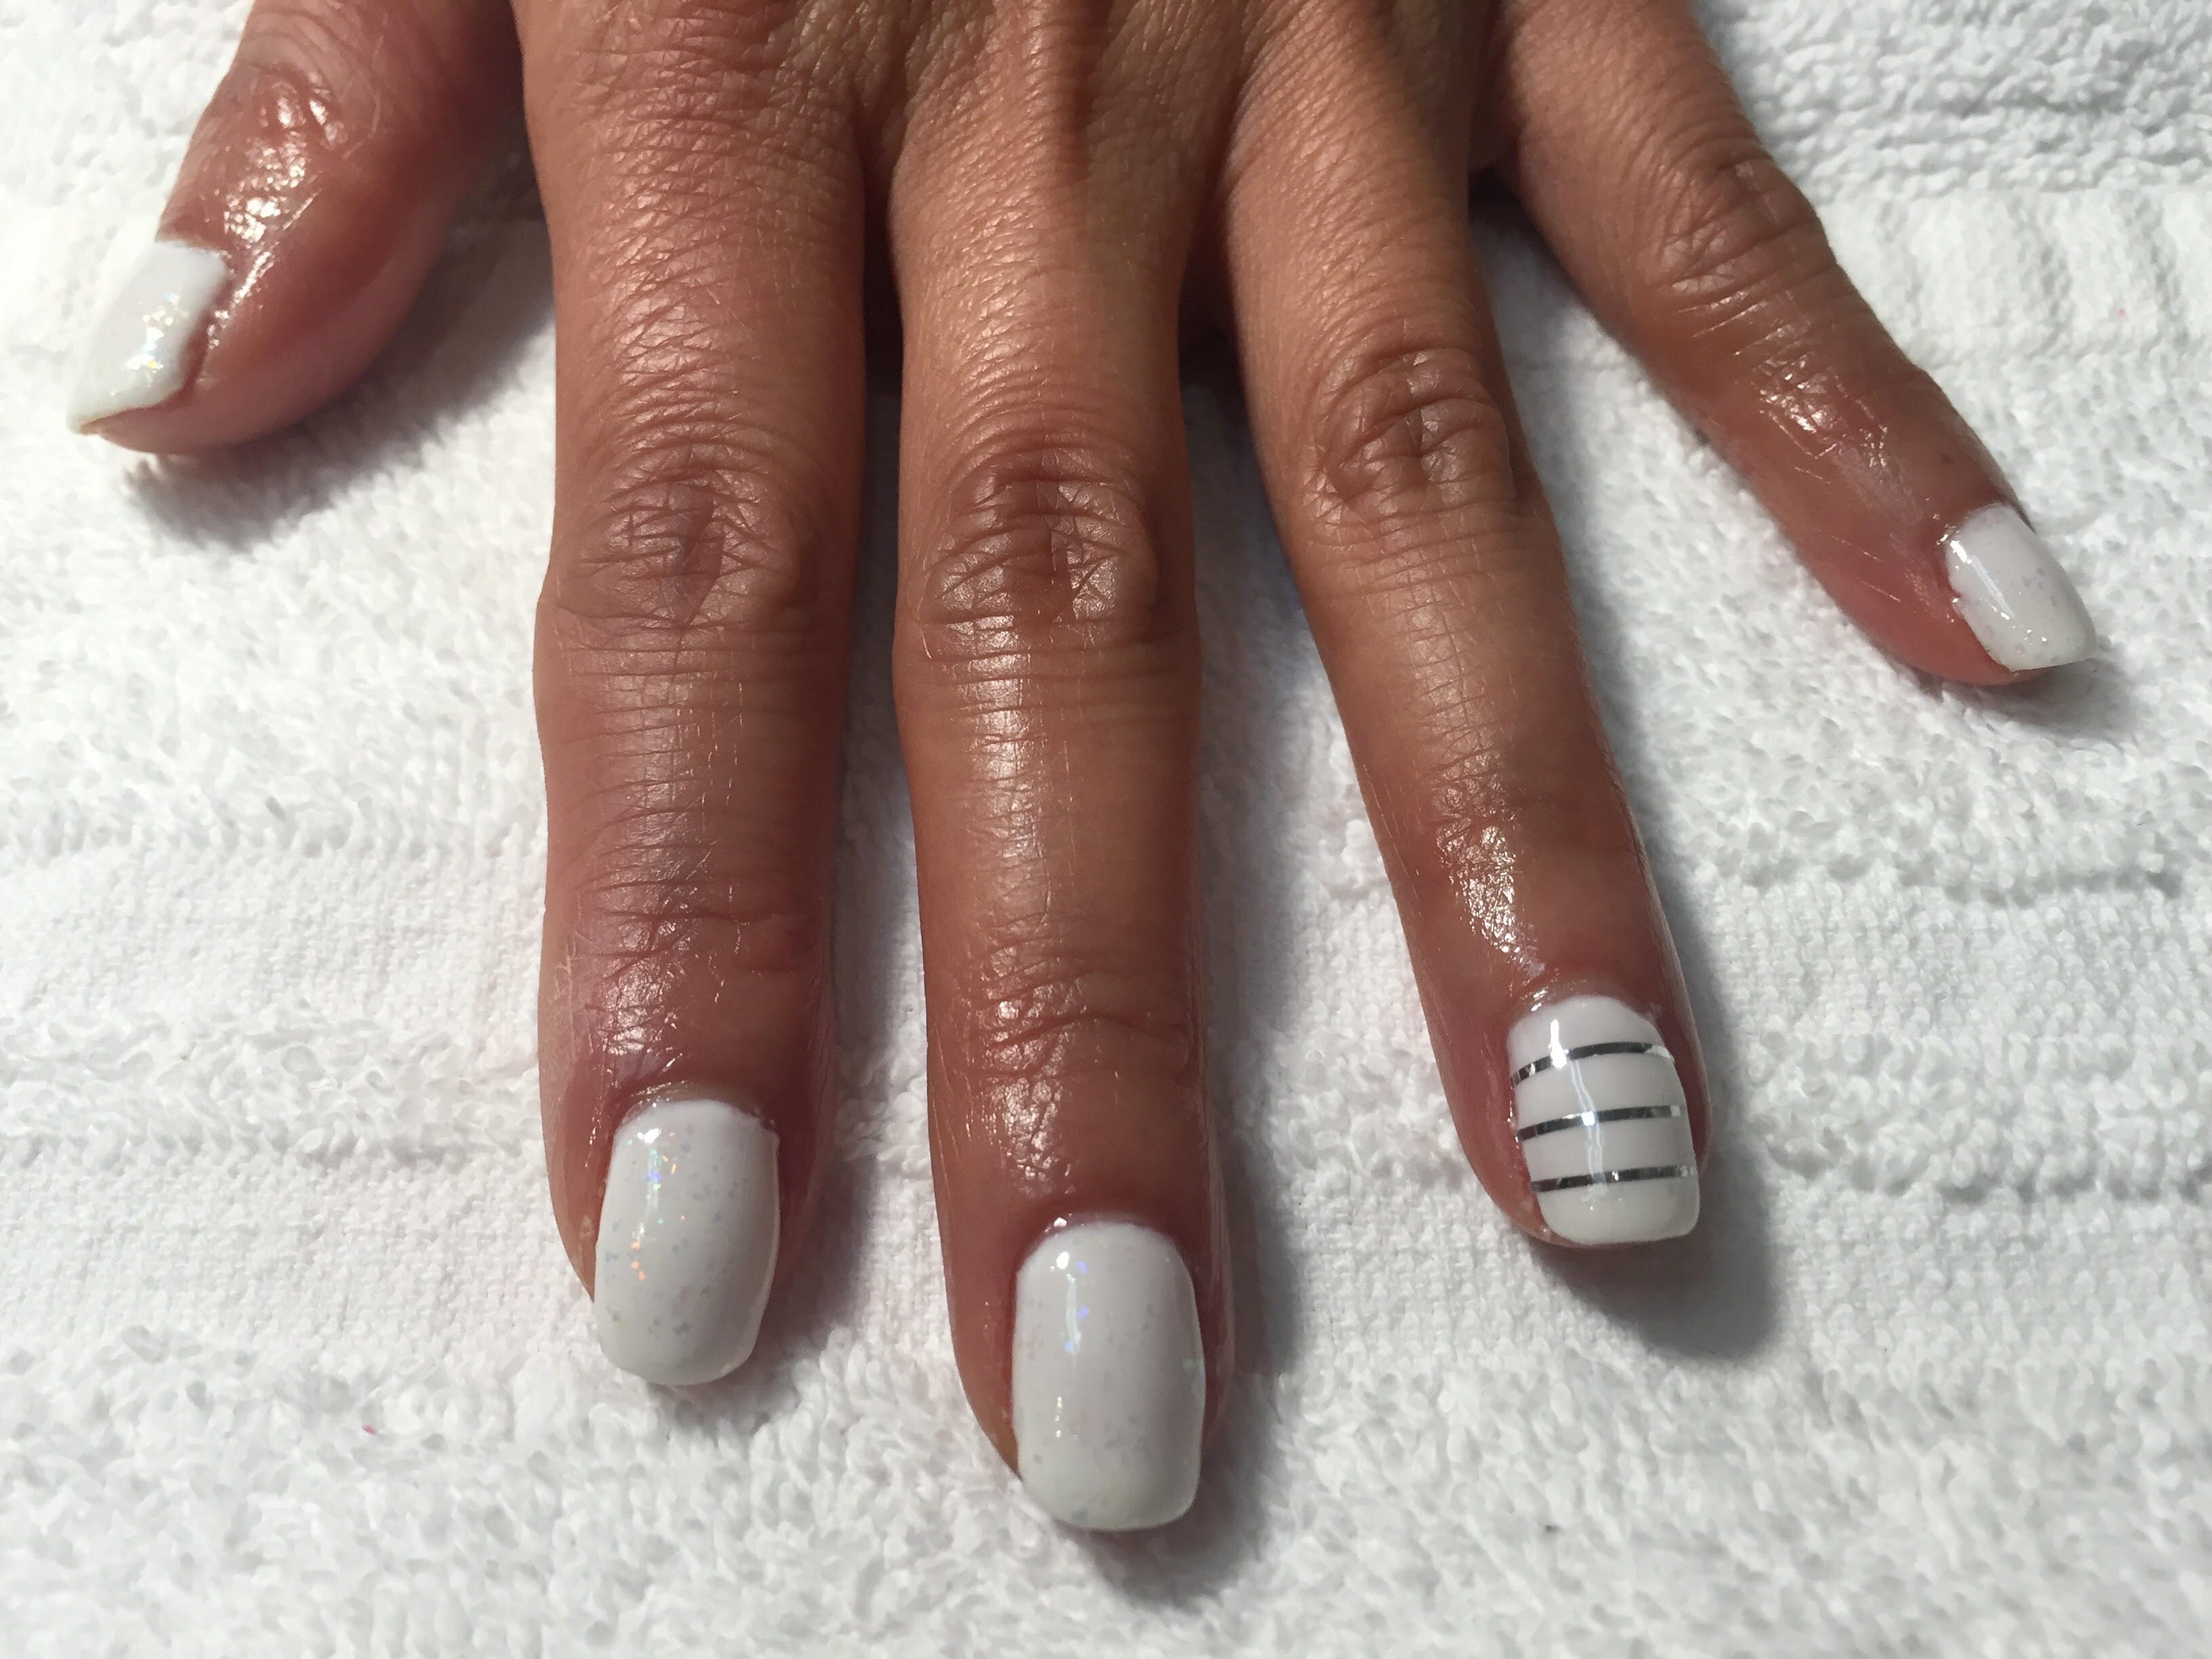 manicure by Amina